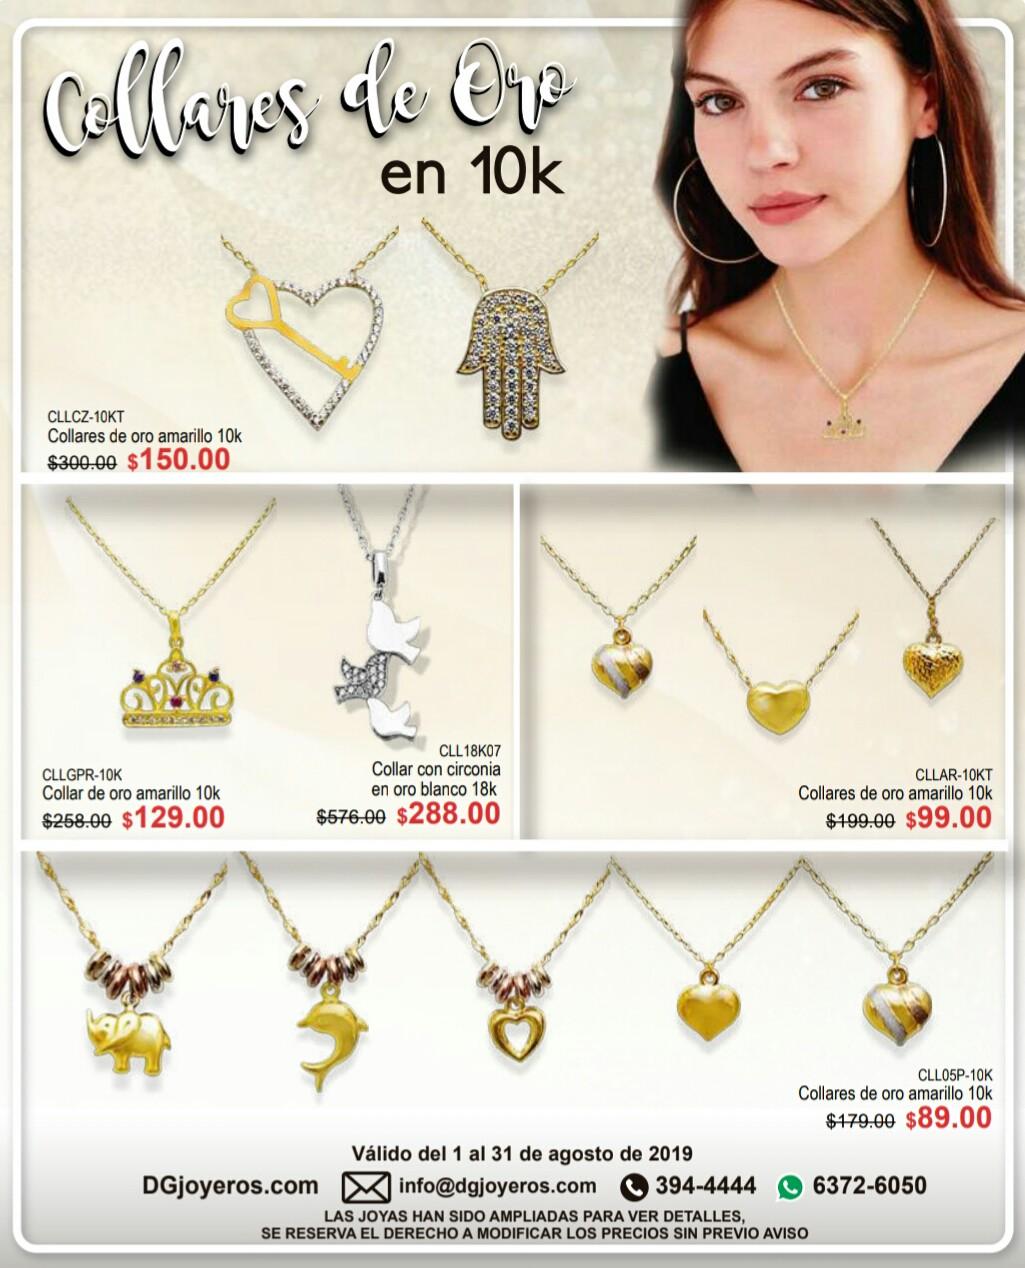 Catalogo de prendas DG Joyeros Agosto 2019 p9